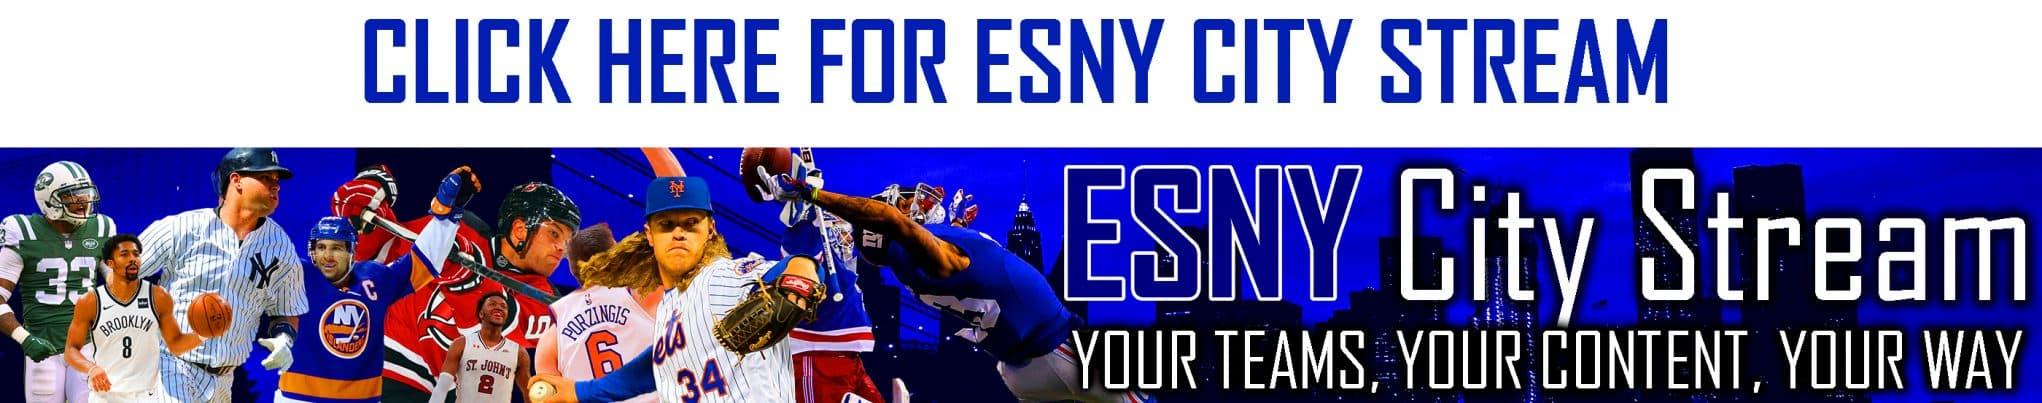 ESNY City Stream